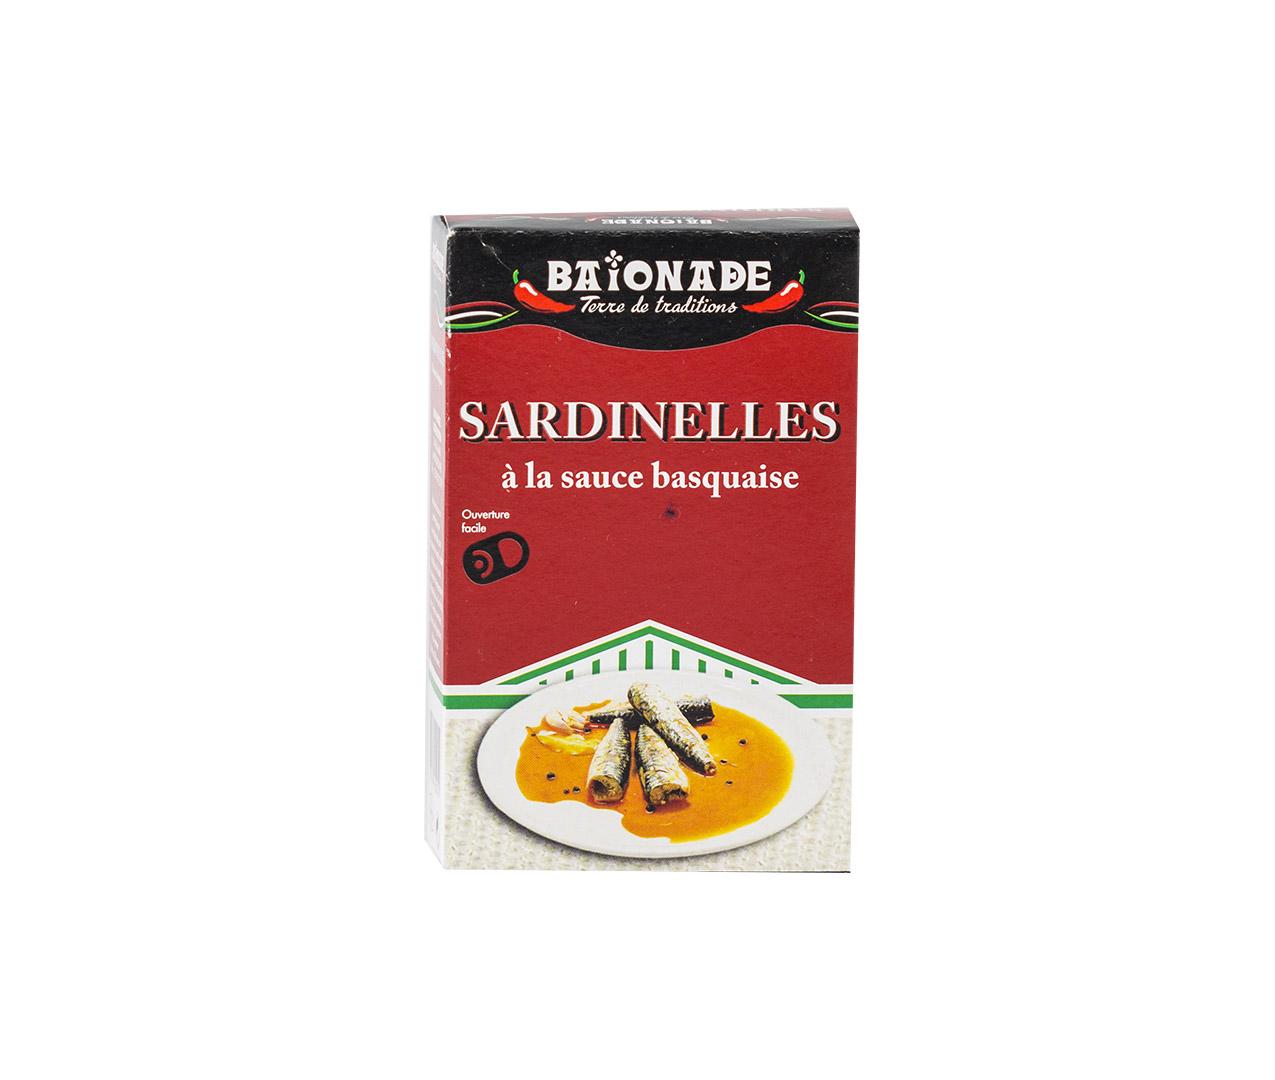 Sardinelles sauce basquaise Baïonade